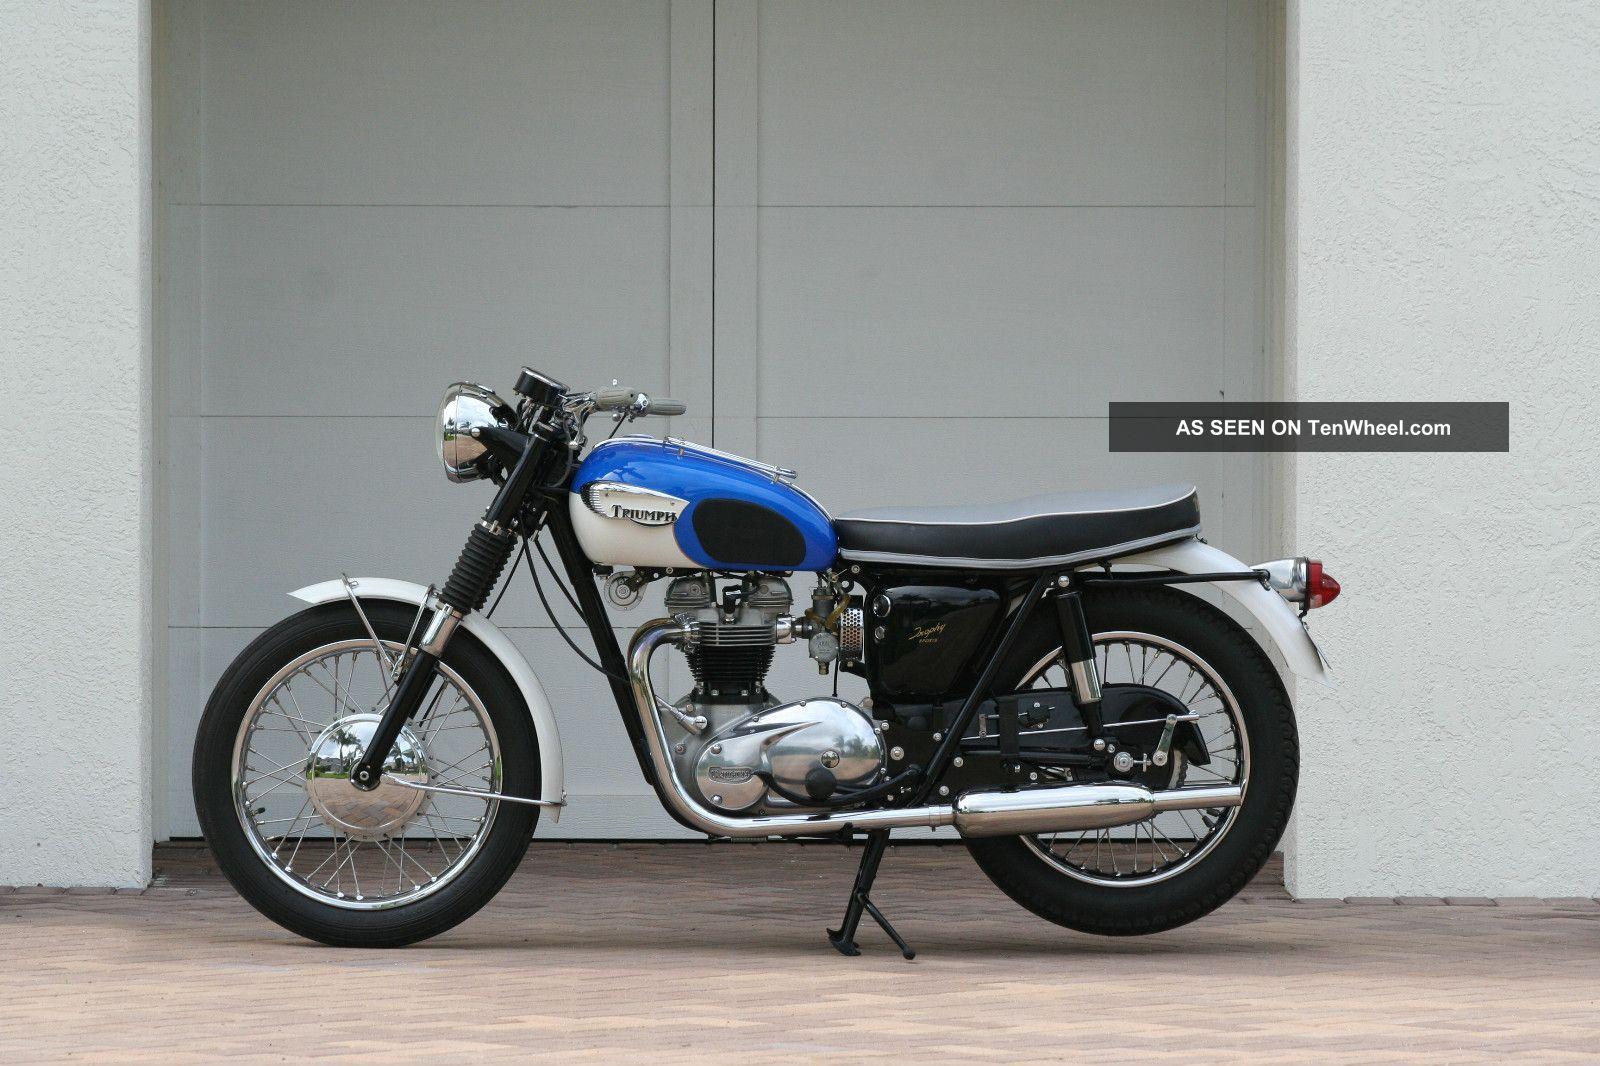 1966 Triumph Tr6sr Trophy Motorcycle Amca Winners Circle